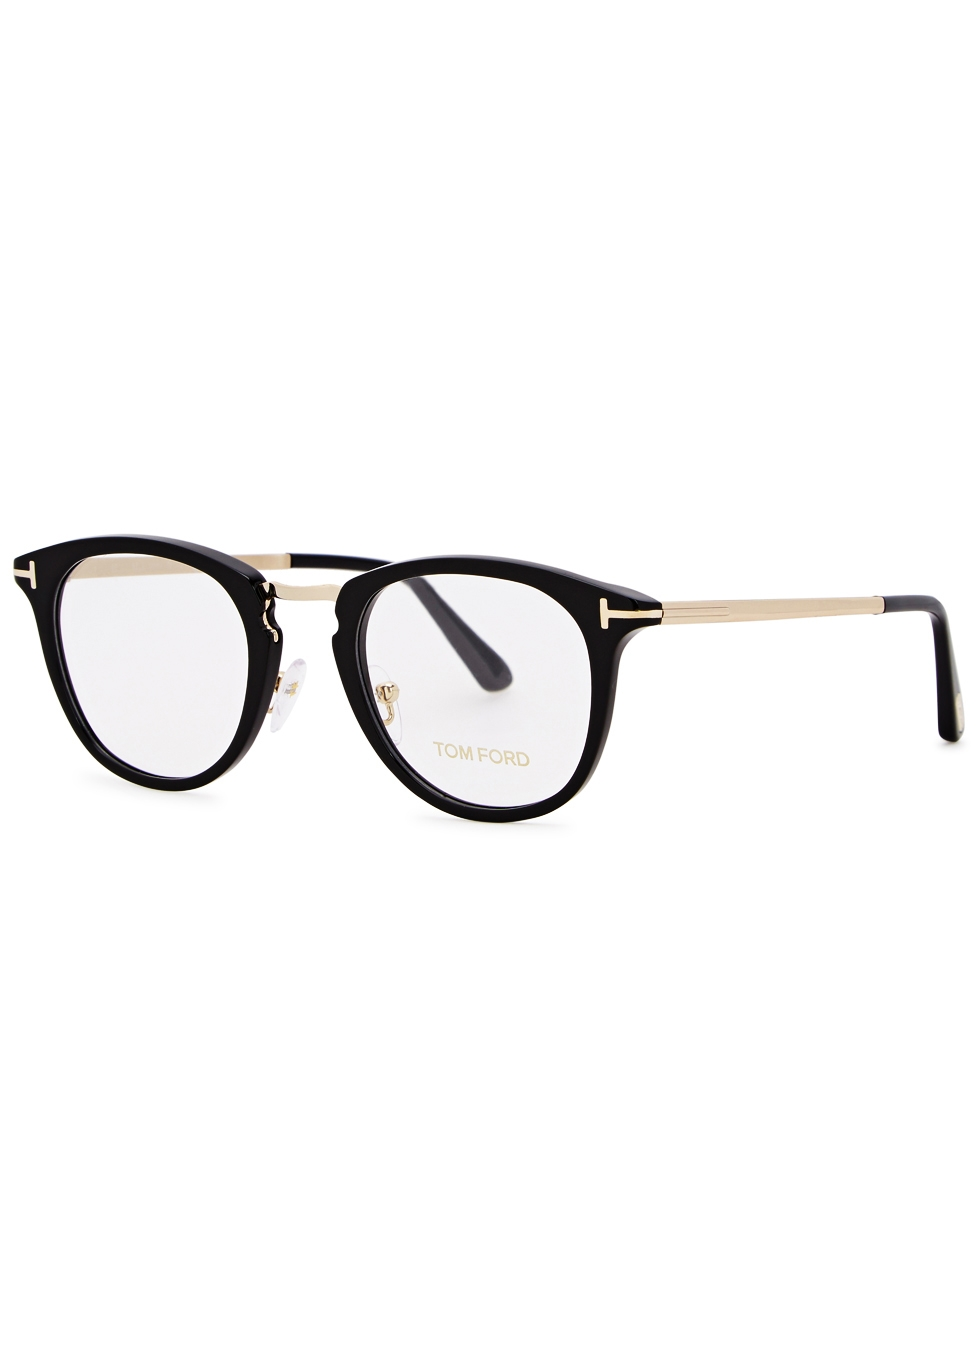 BLACK OVAL-FRAME OPTICAL GLASSES